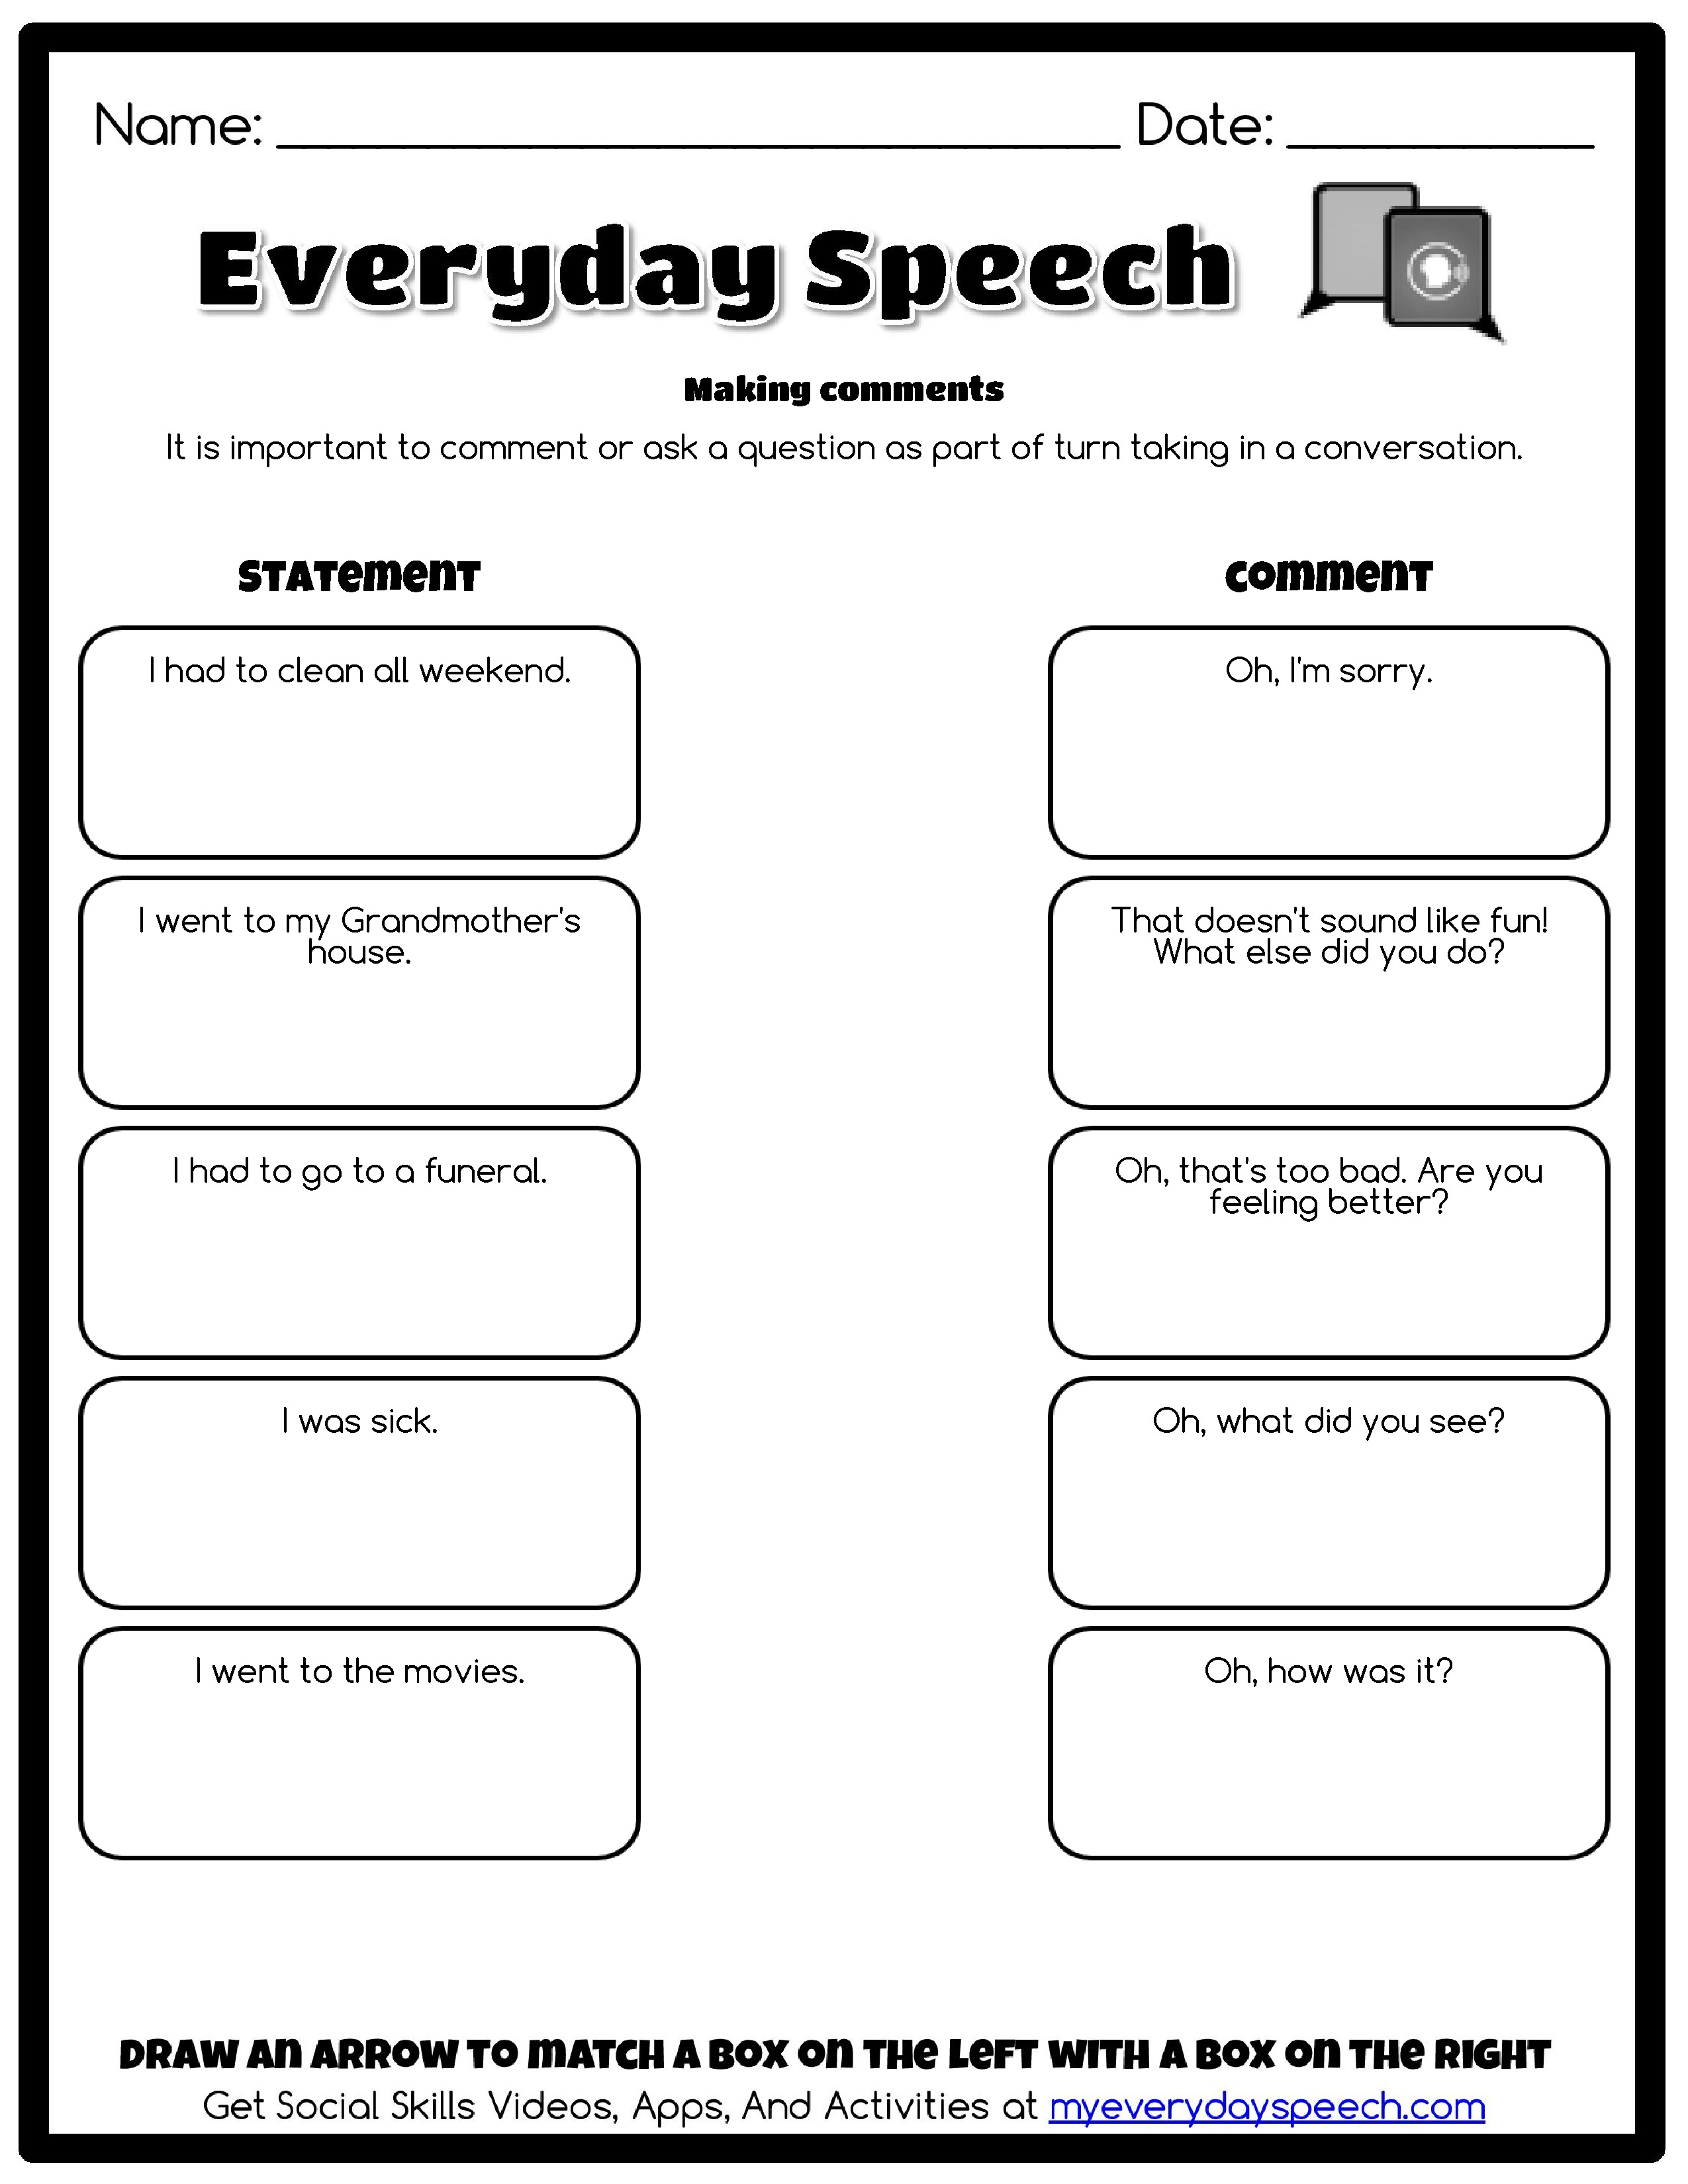 Homework sheet for Mrs. Grijalva